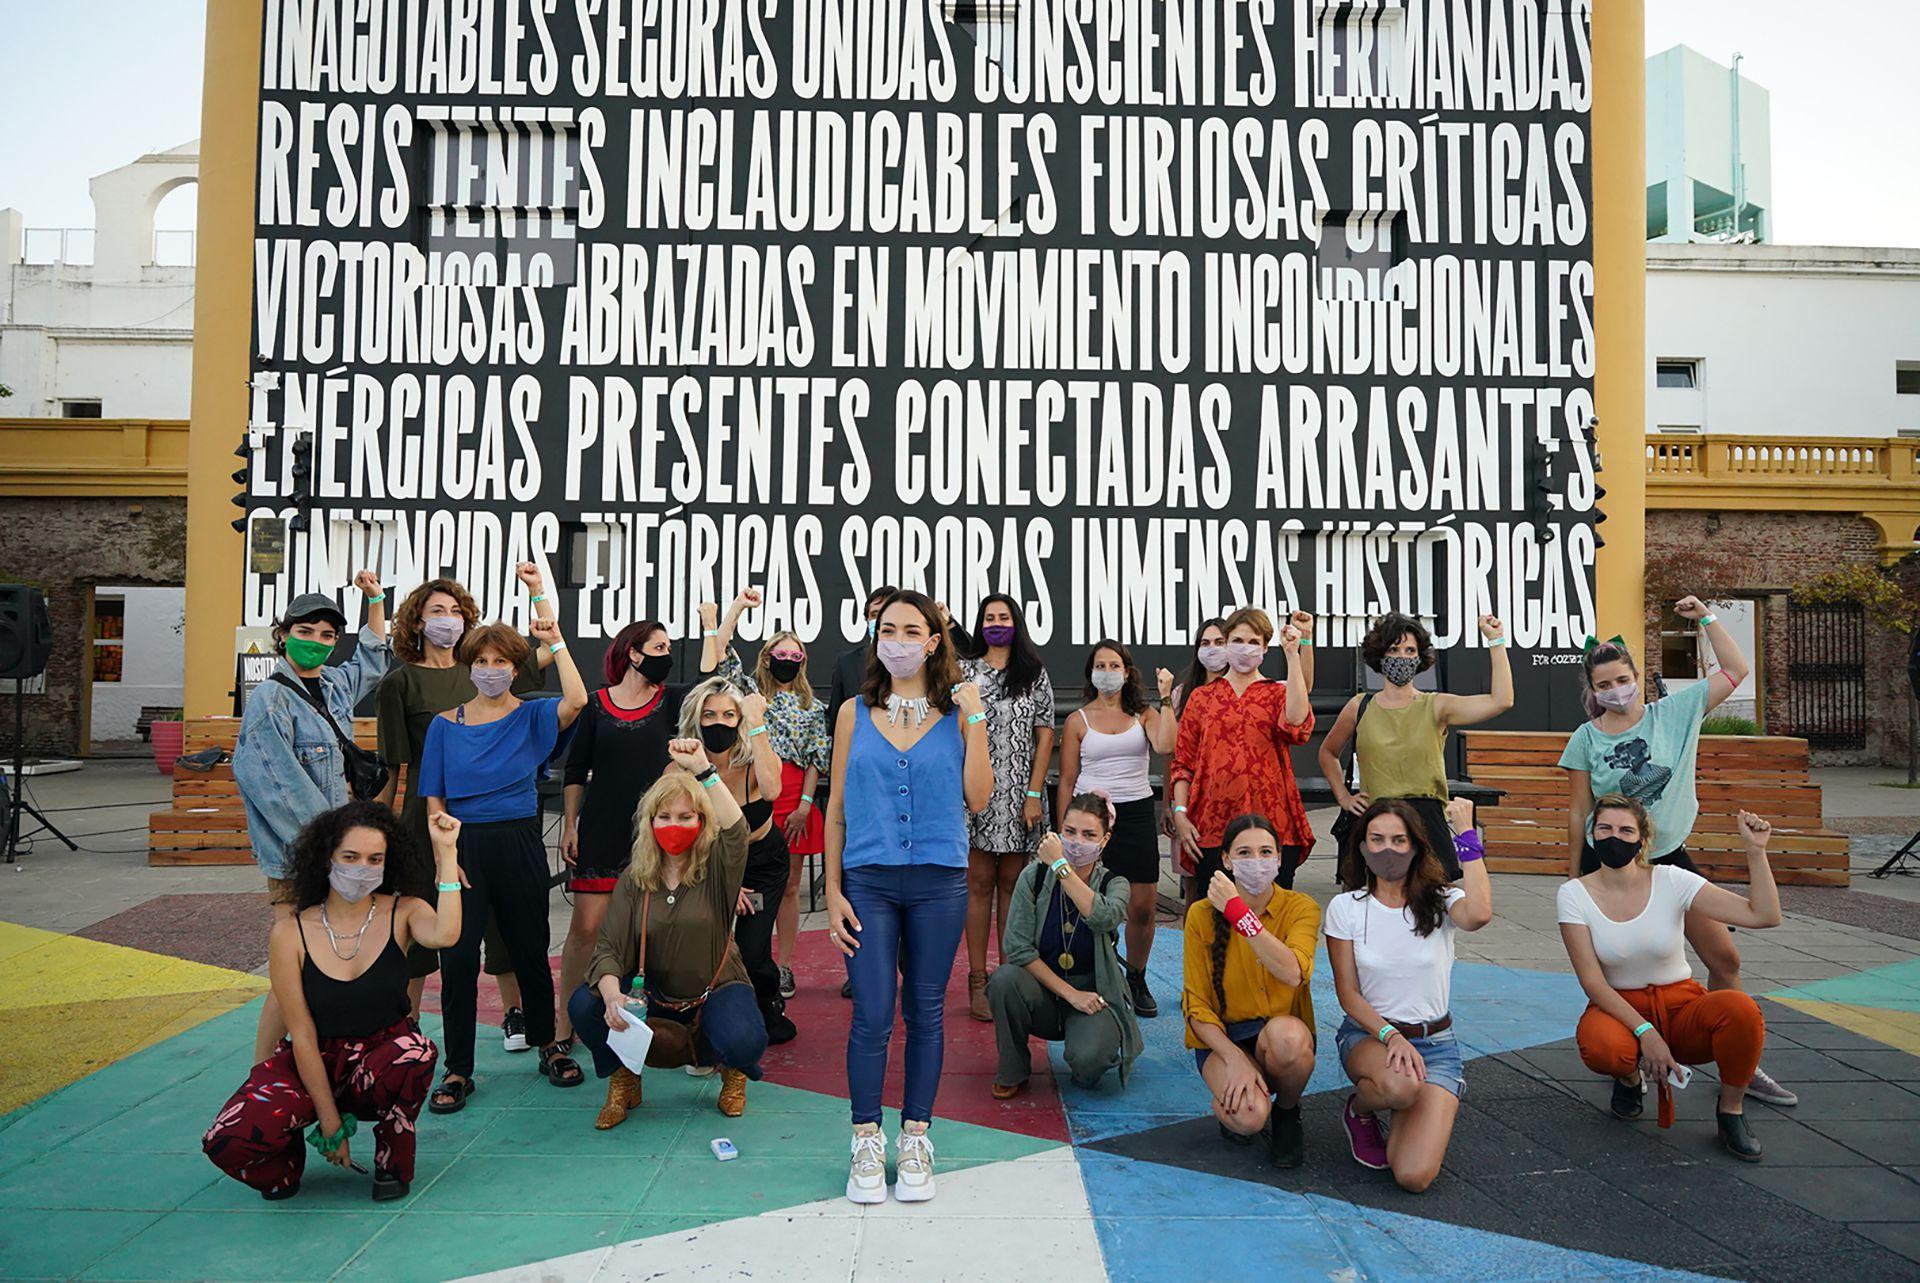 Conferencia prensa Thelma Fardin -  Actrices Argentinas